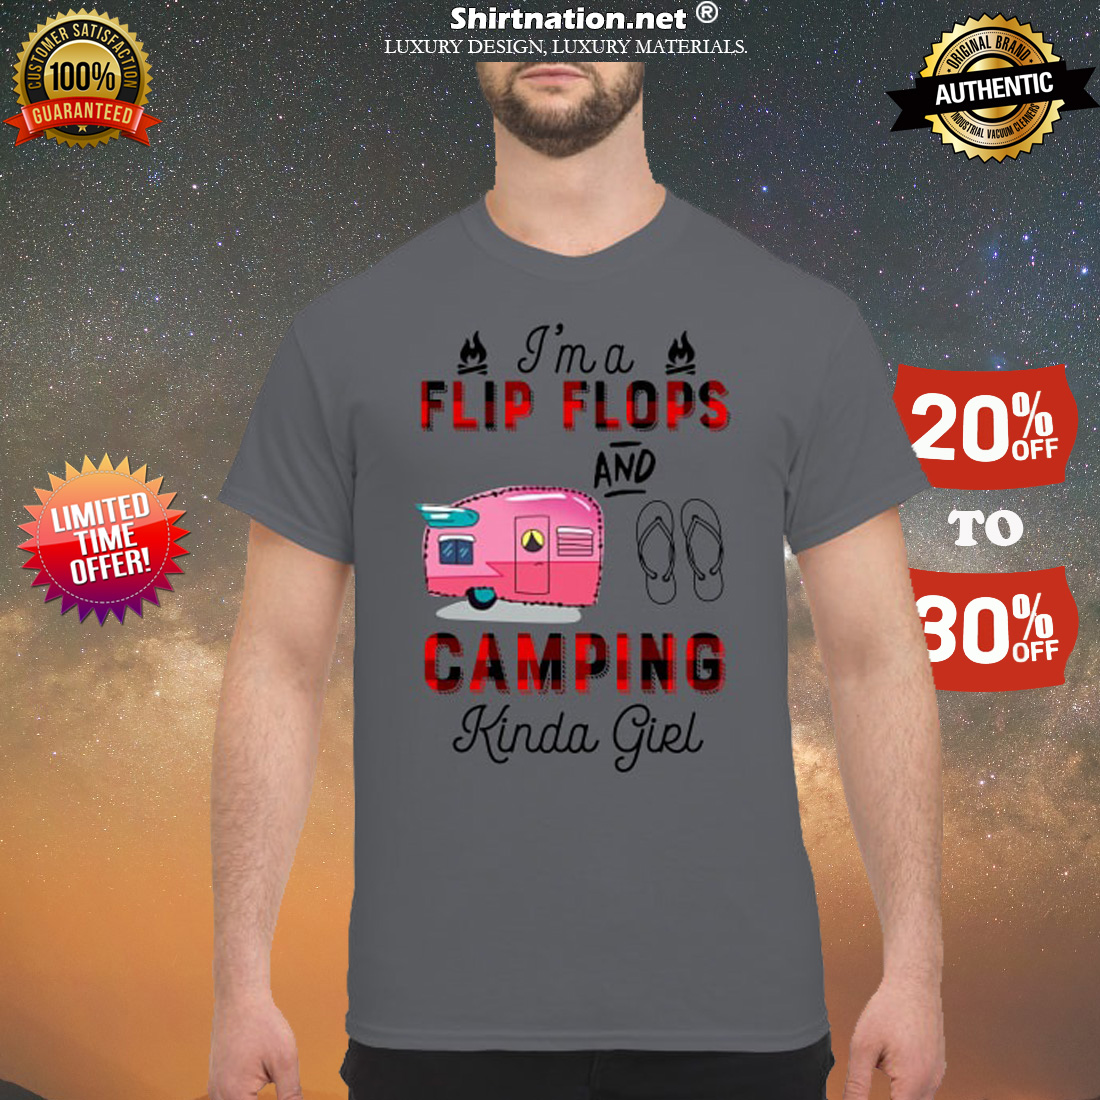 I'm a flip flops and camping kinda girl classic shirt